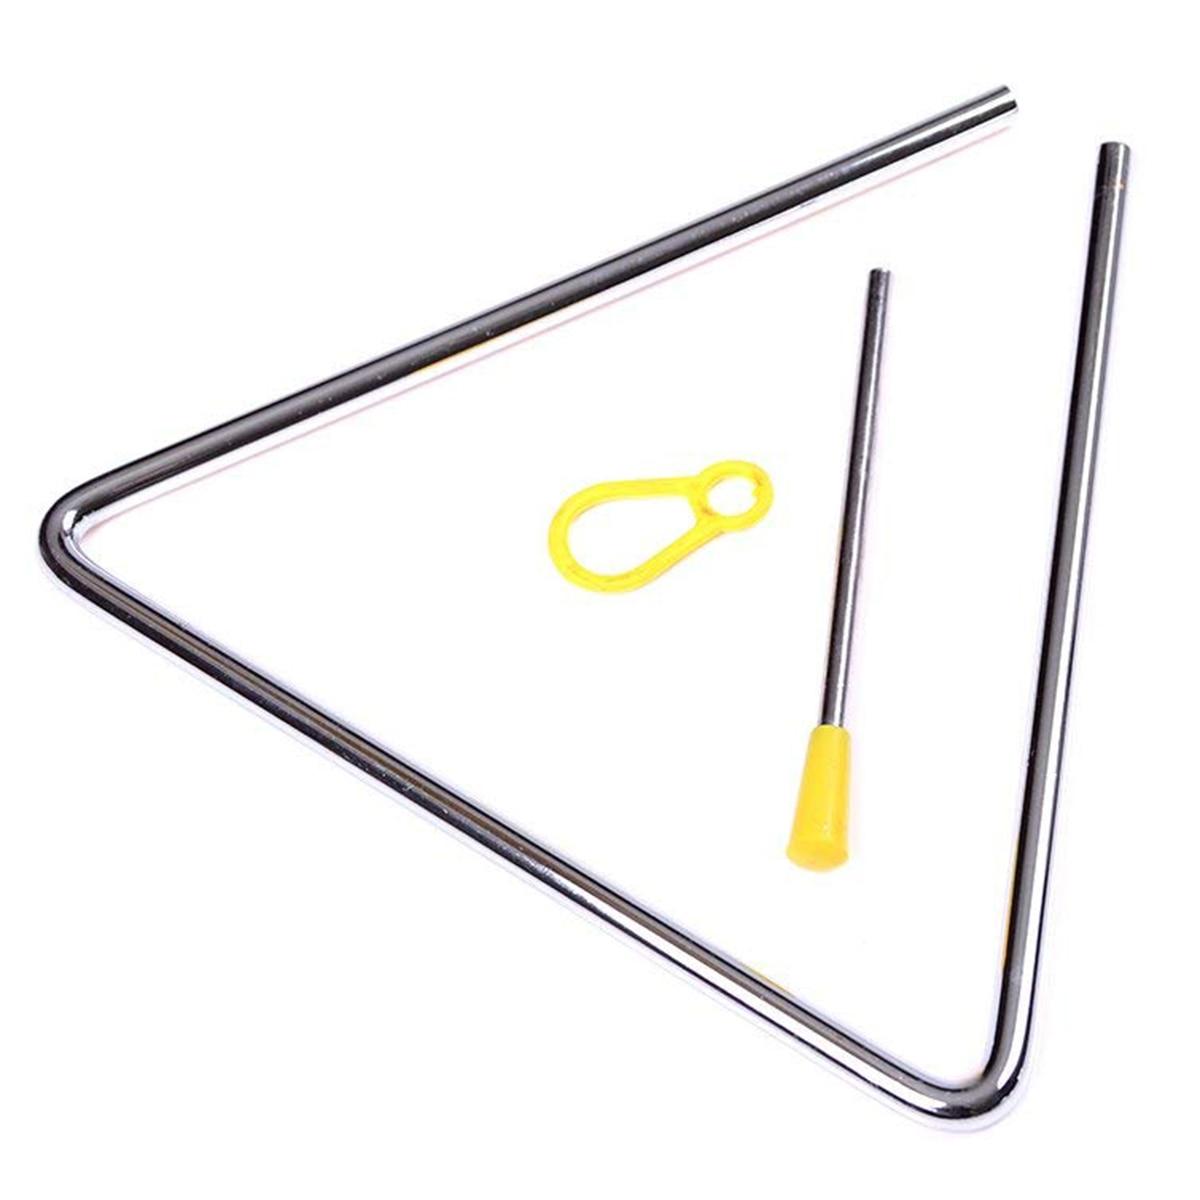 2 Pack 6 inch Music triangular Instrument Set with Striker for kids